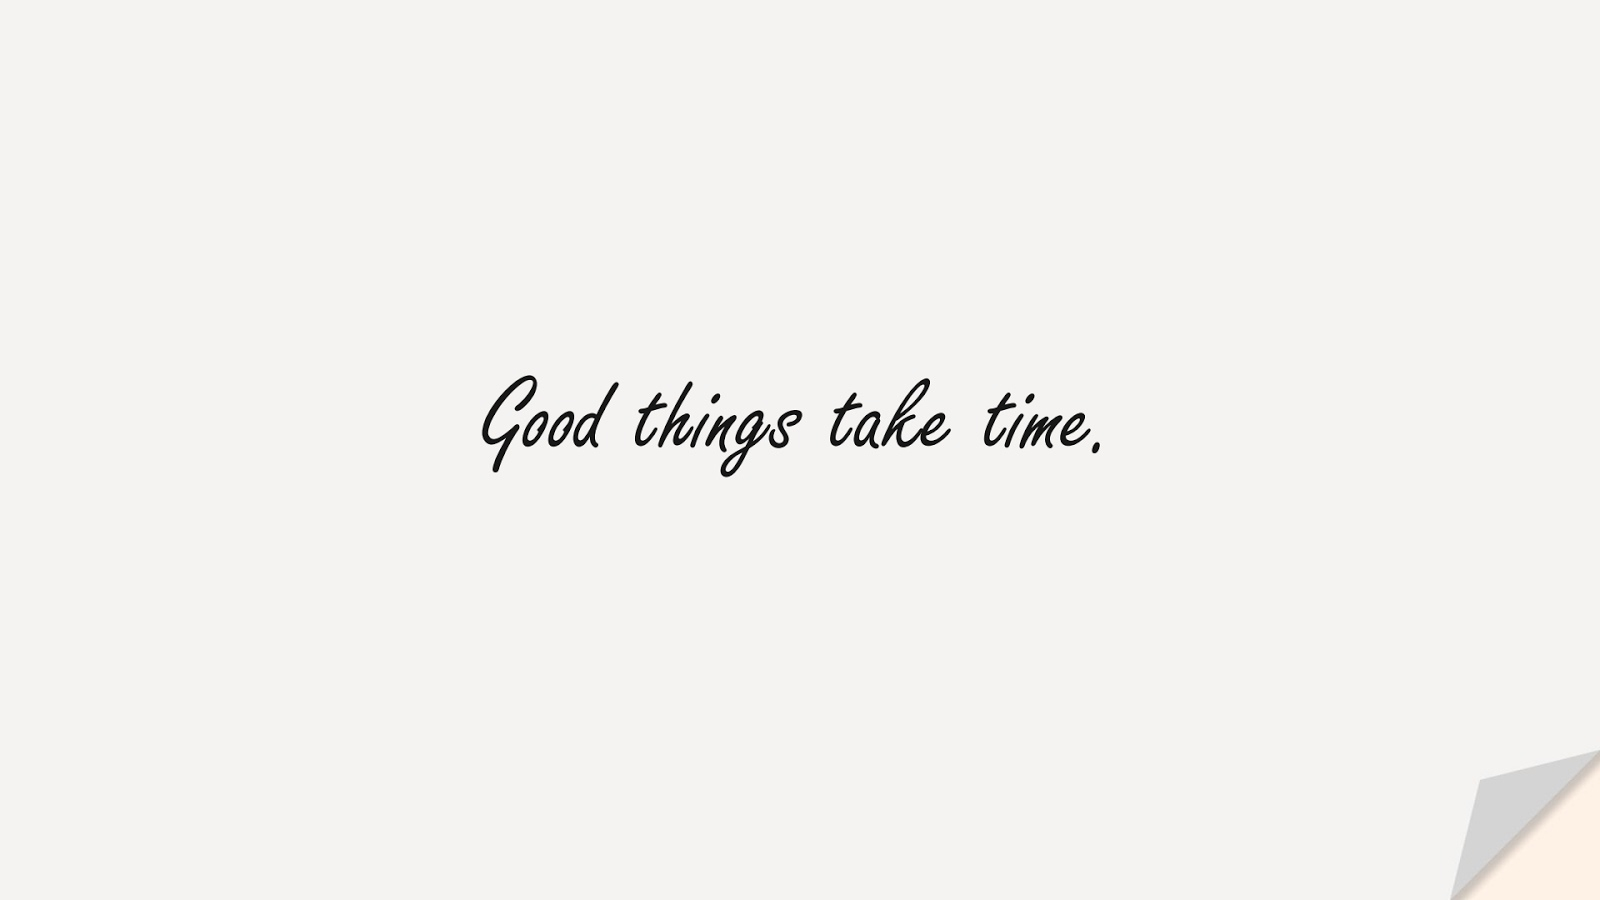 Good things take time.FALSE